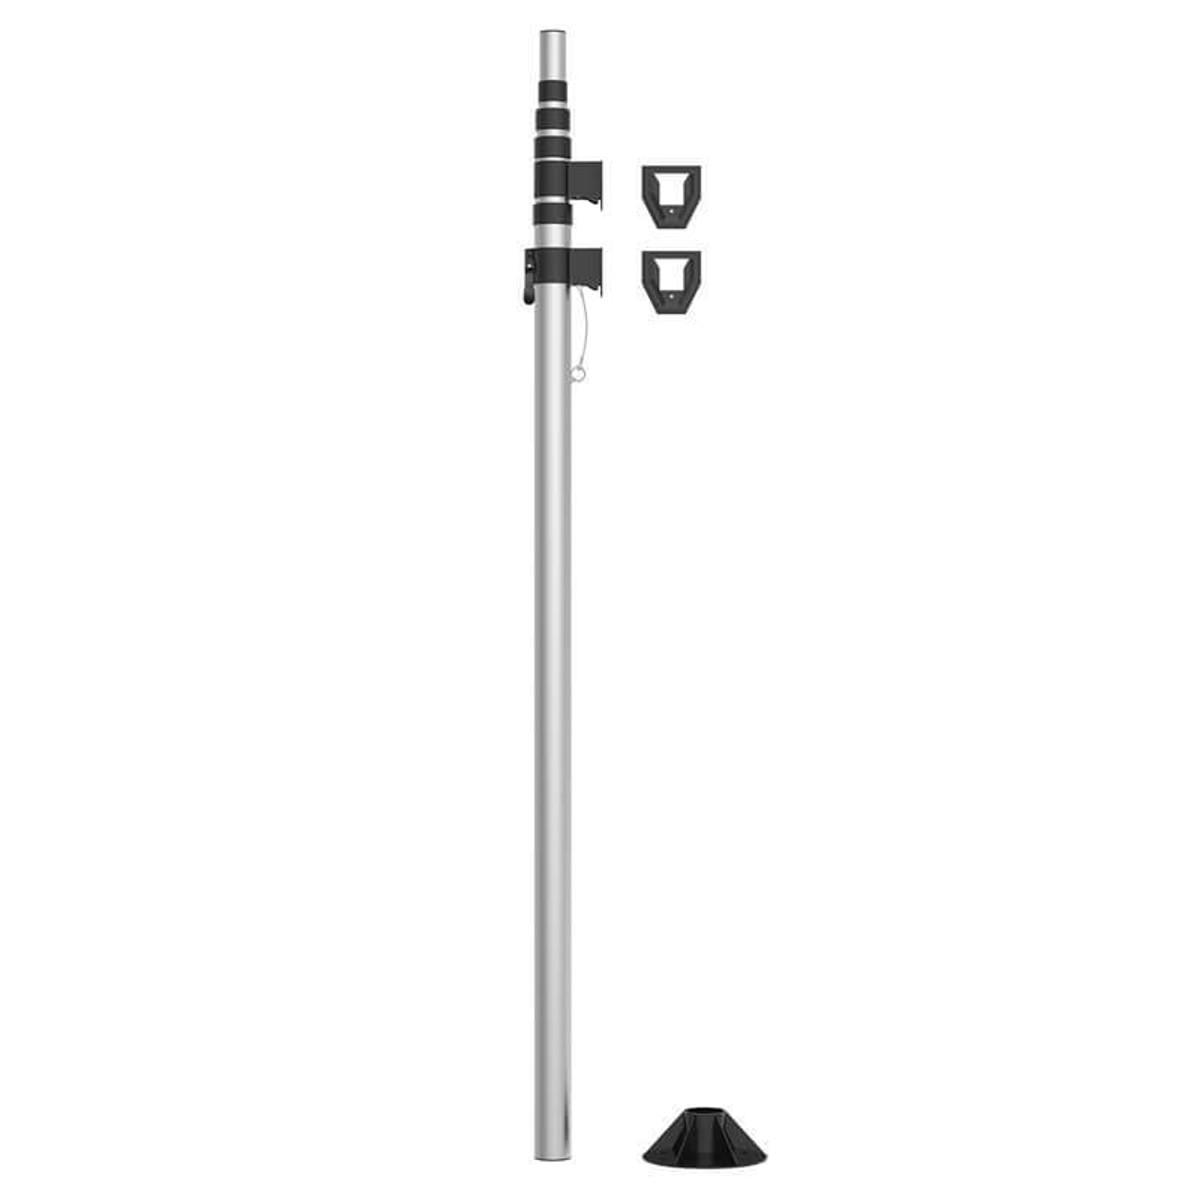 Wilson 900203 Telescoping Antenna Mounting Pole, 25 Ft